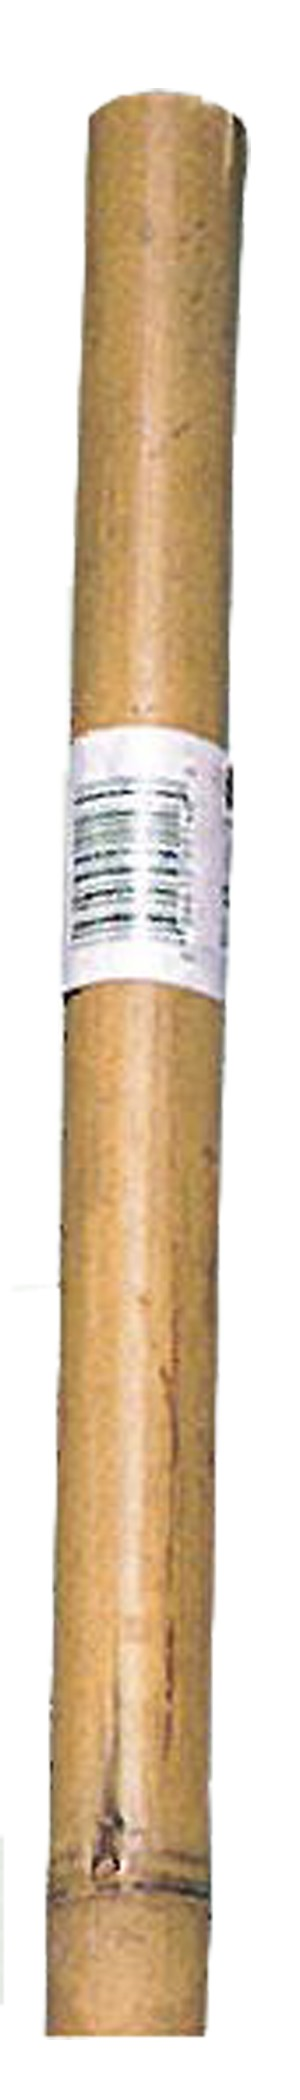 Bond Super Bamboo Pole Brown 25ea/8Ftx1 in